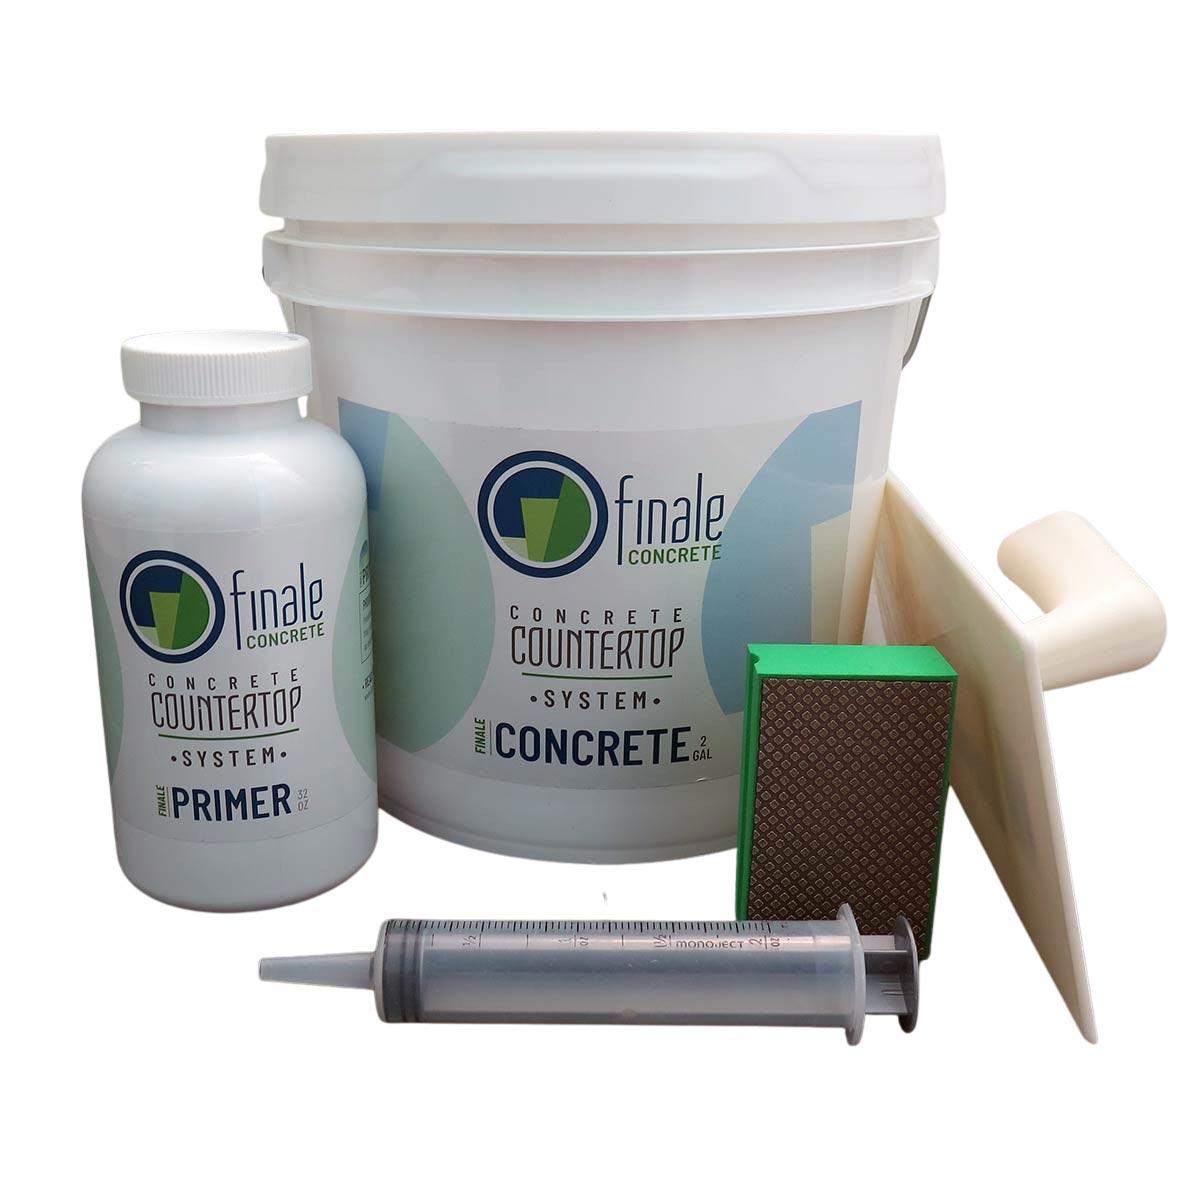 Finale DIY Concrete Countertop System